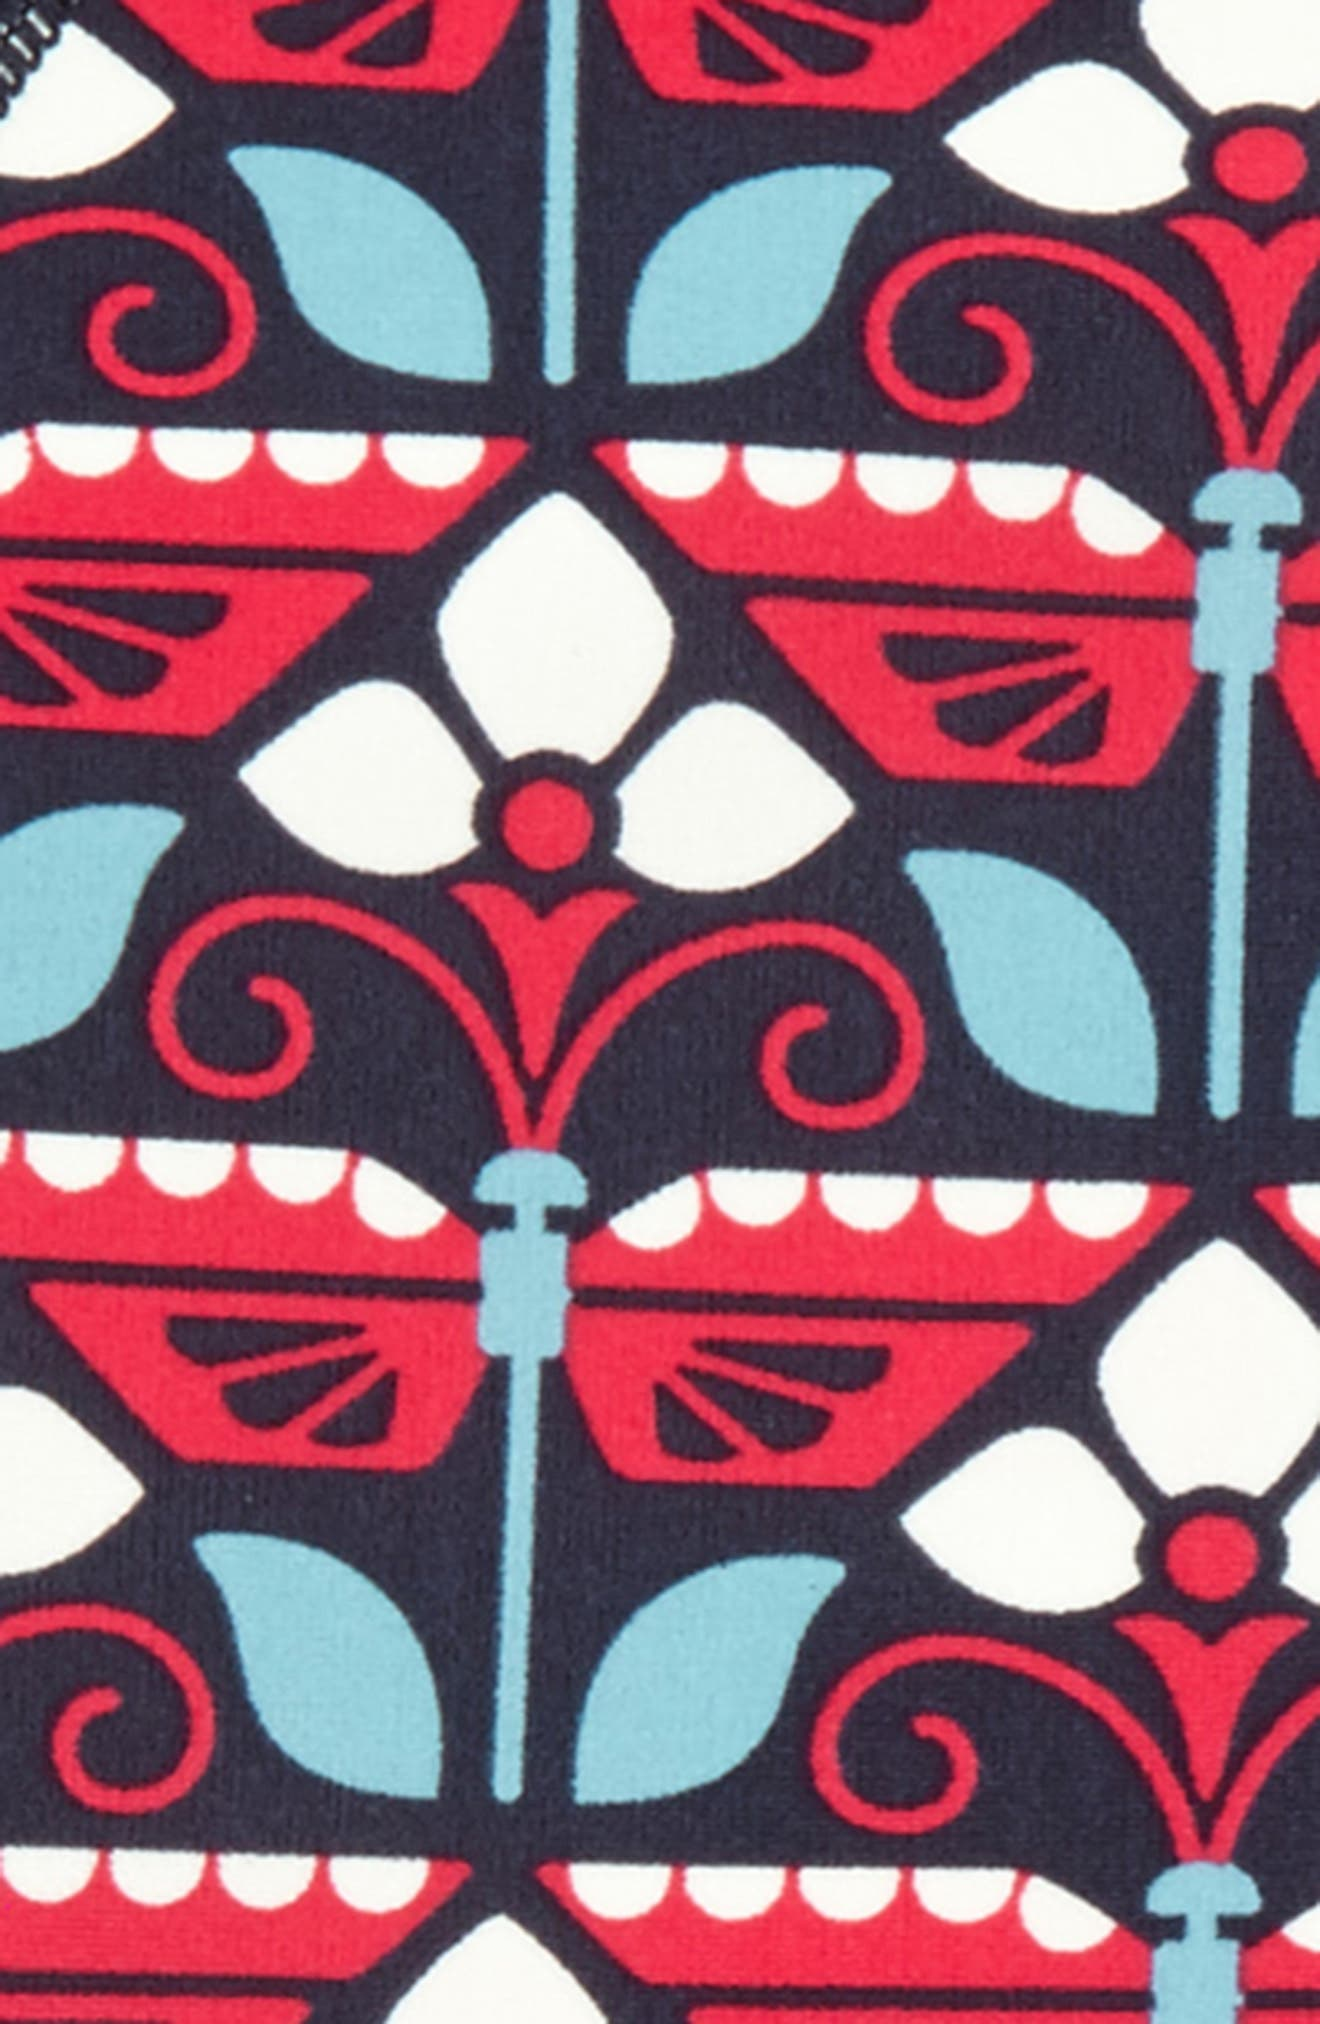 Kaleidoscope Two-Piece Rashguard Swimsuit,                             Alternate thumbnail 2, color,                             Indigo